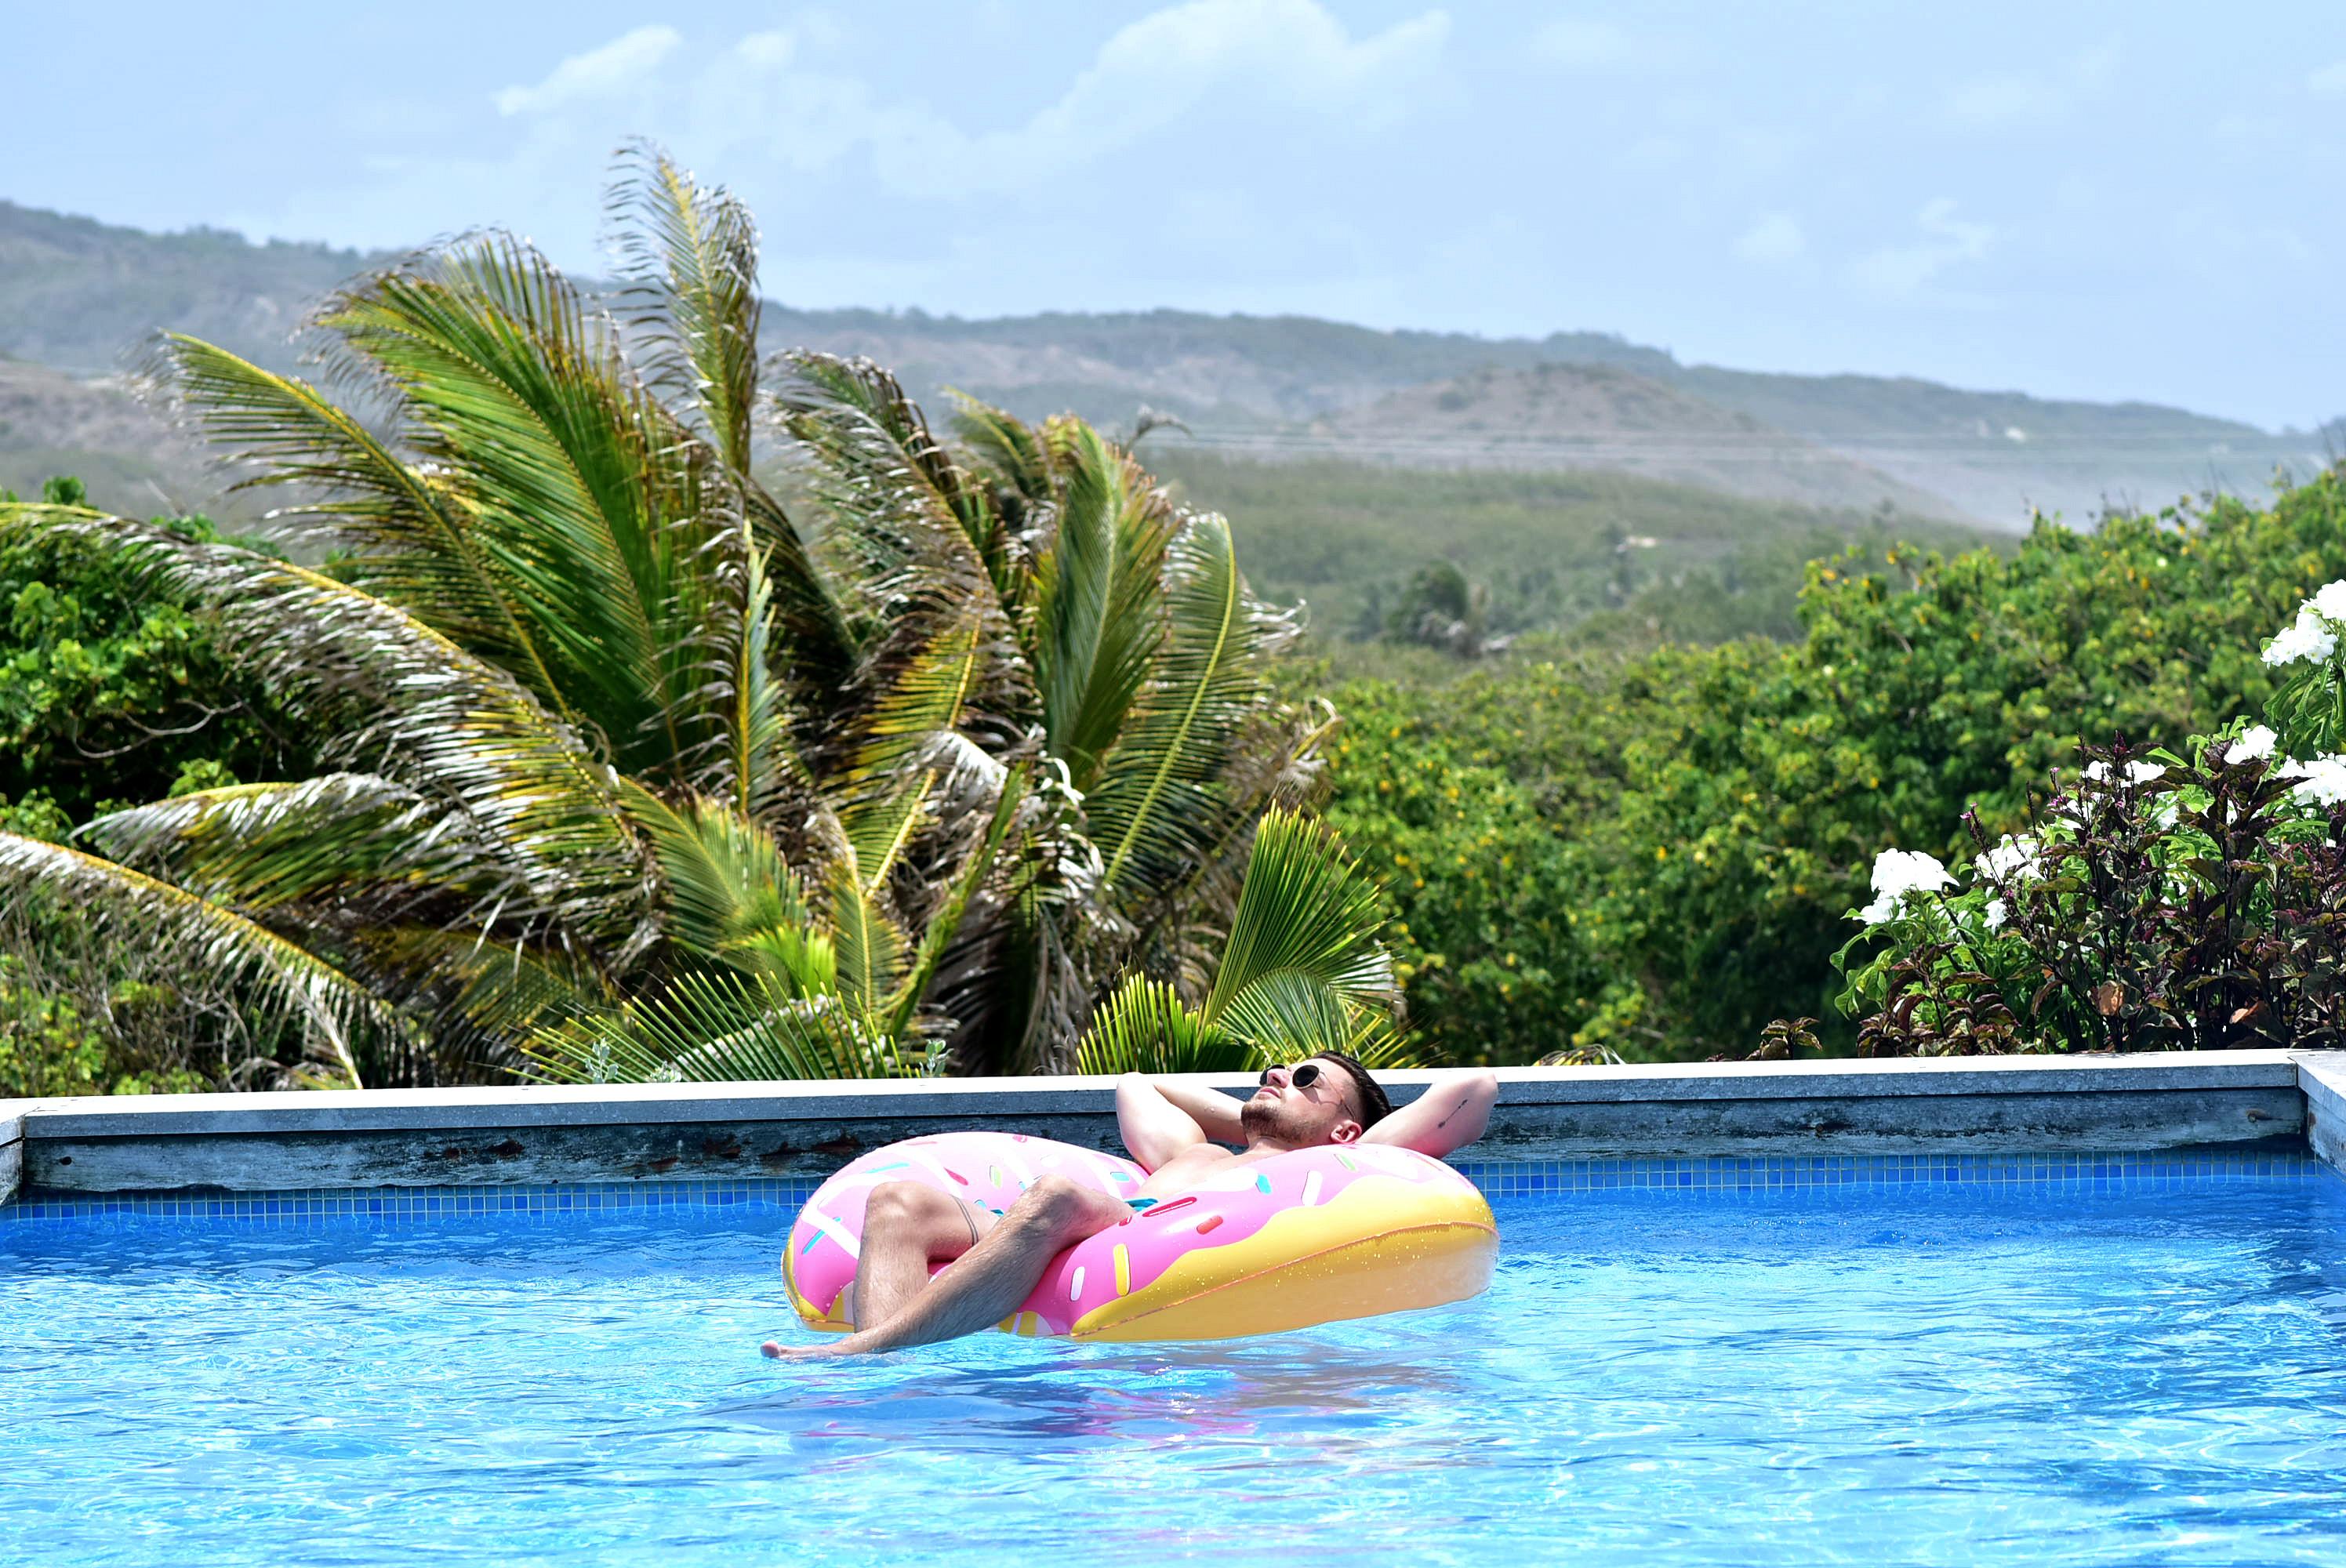 Tommeezjerry-Männerblog-Berlinblog-Fashionblog-Styleblog-Travelblog-Travel-Reiseblog-Reisen-Barbados-Karibik-Carribean-Summer-Sommer-Vacation-4